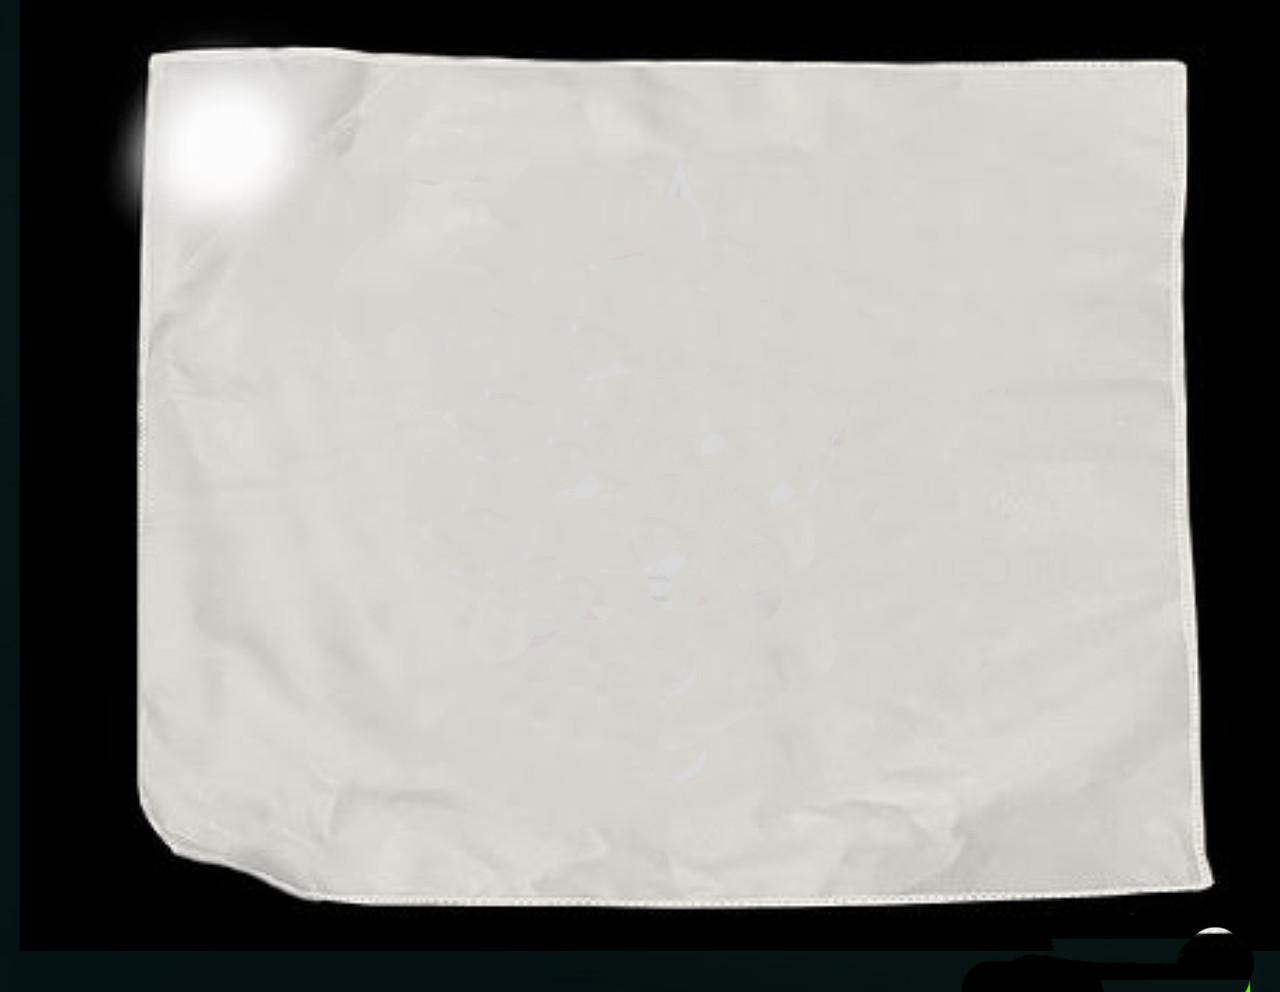 LED,Spirit, towel, promo, custom, print, rag, cloth, bottle, service